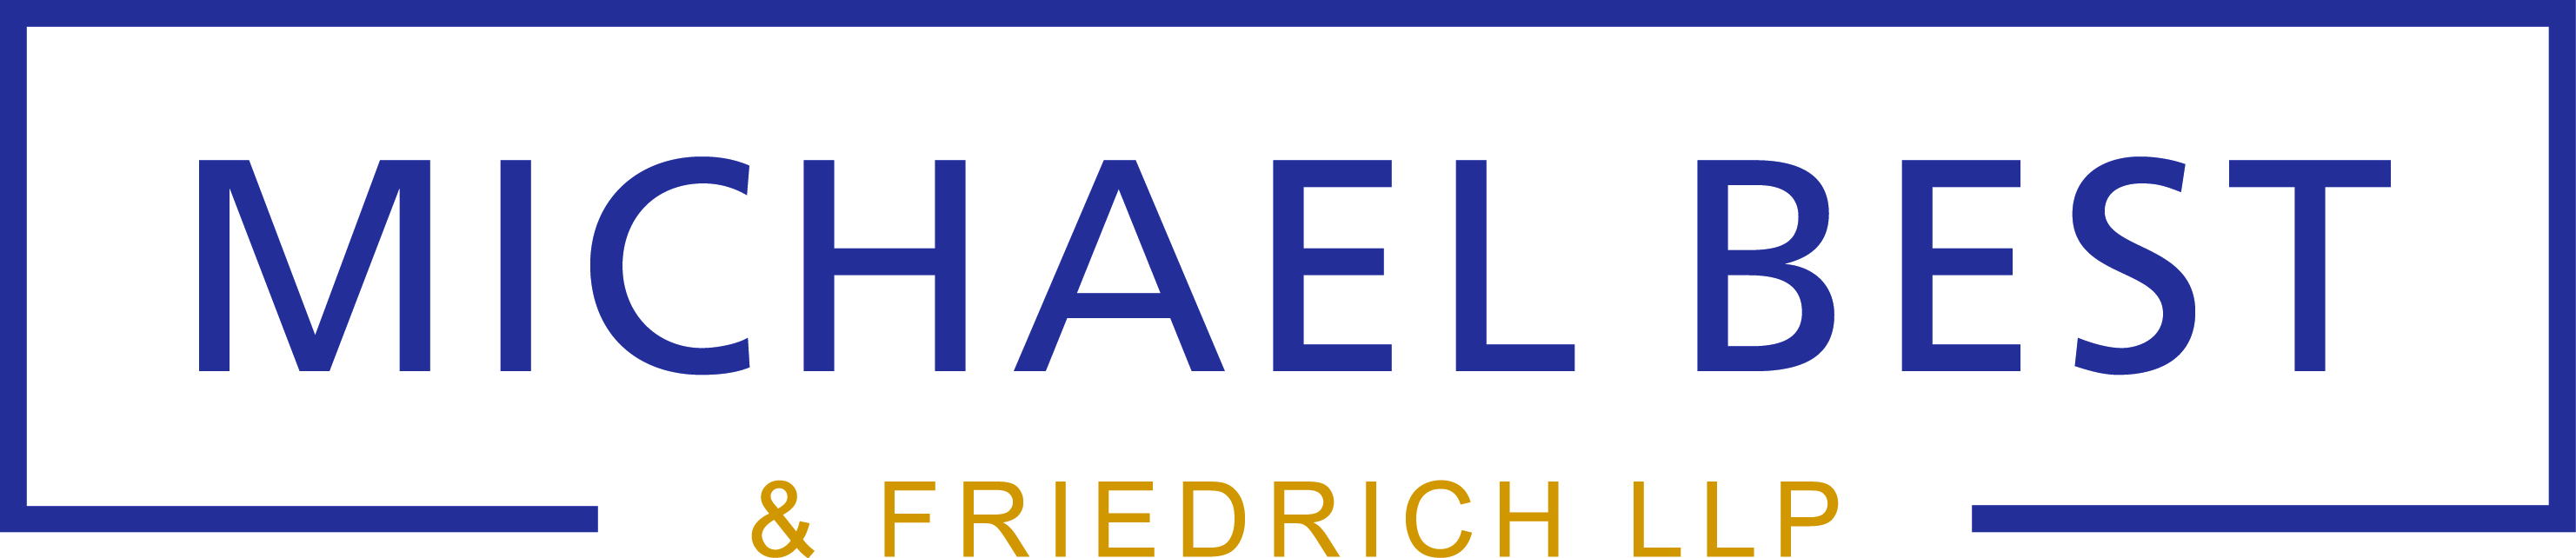 Michael Best & Friedrich LLP